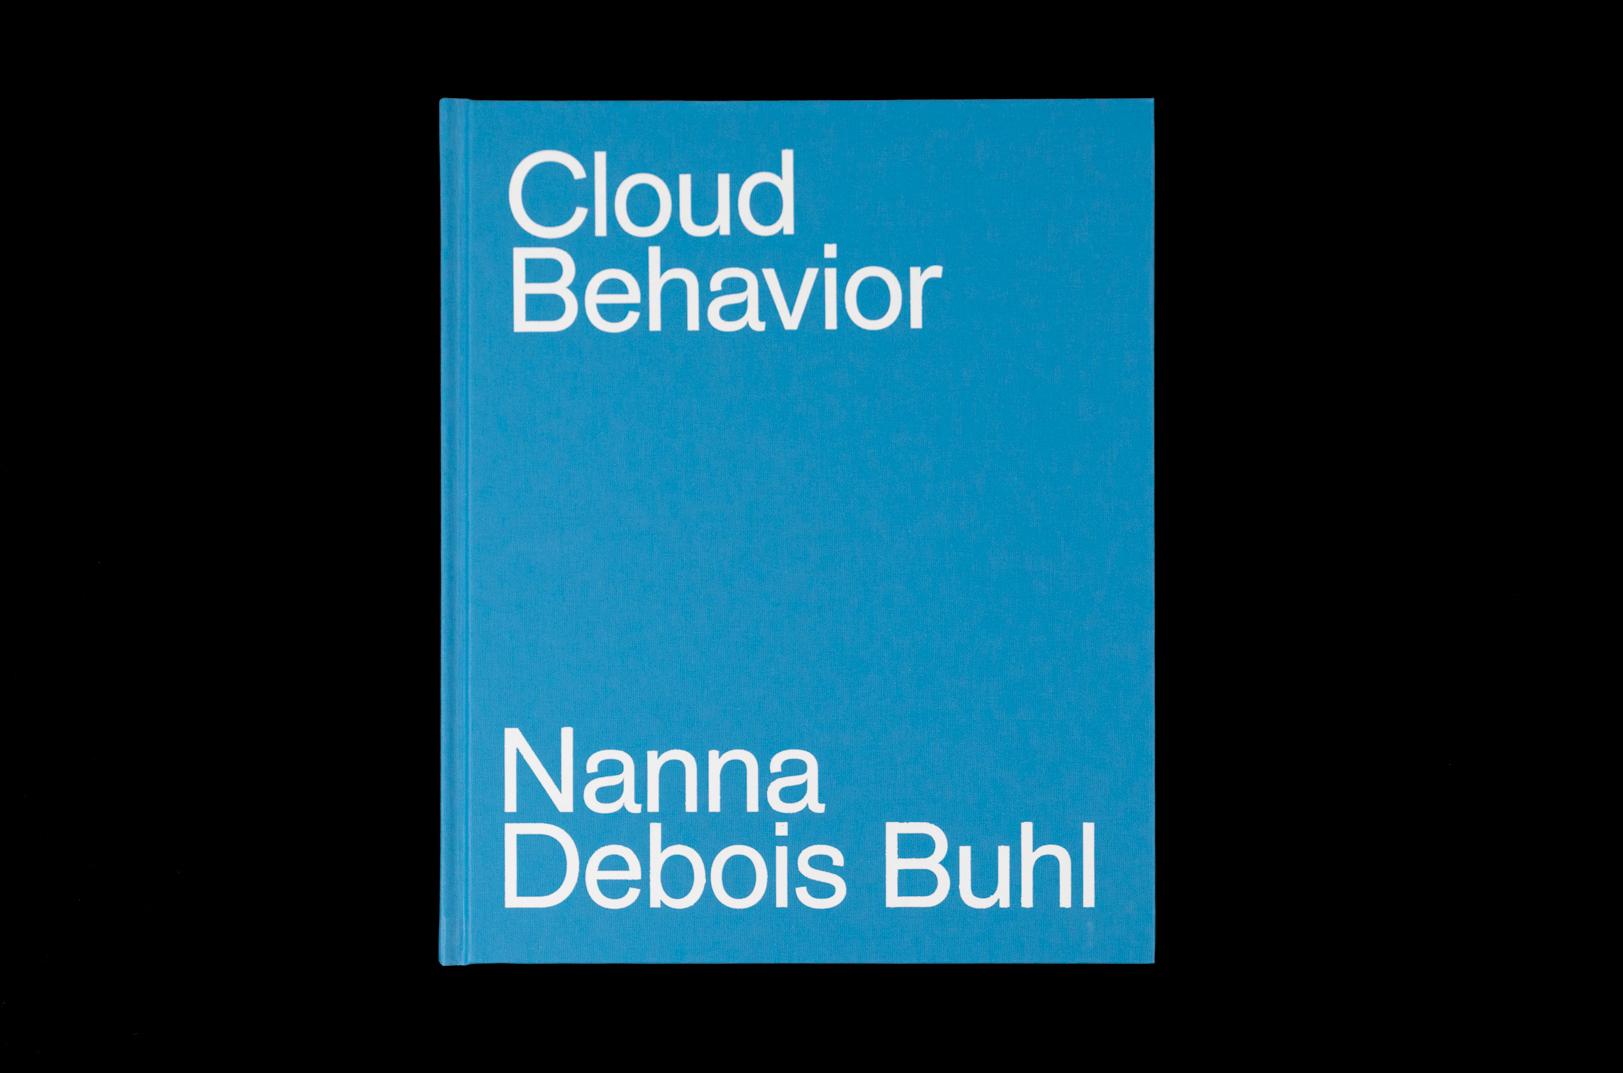 Buhl, Nanna Debois. Cloud Behavior